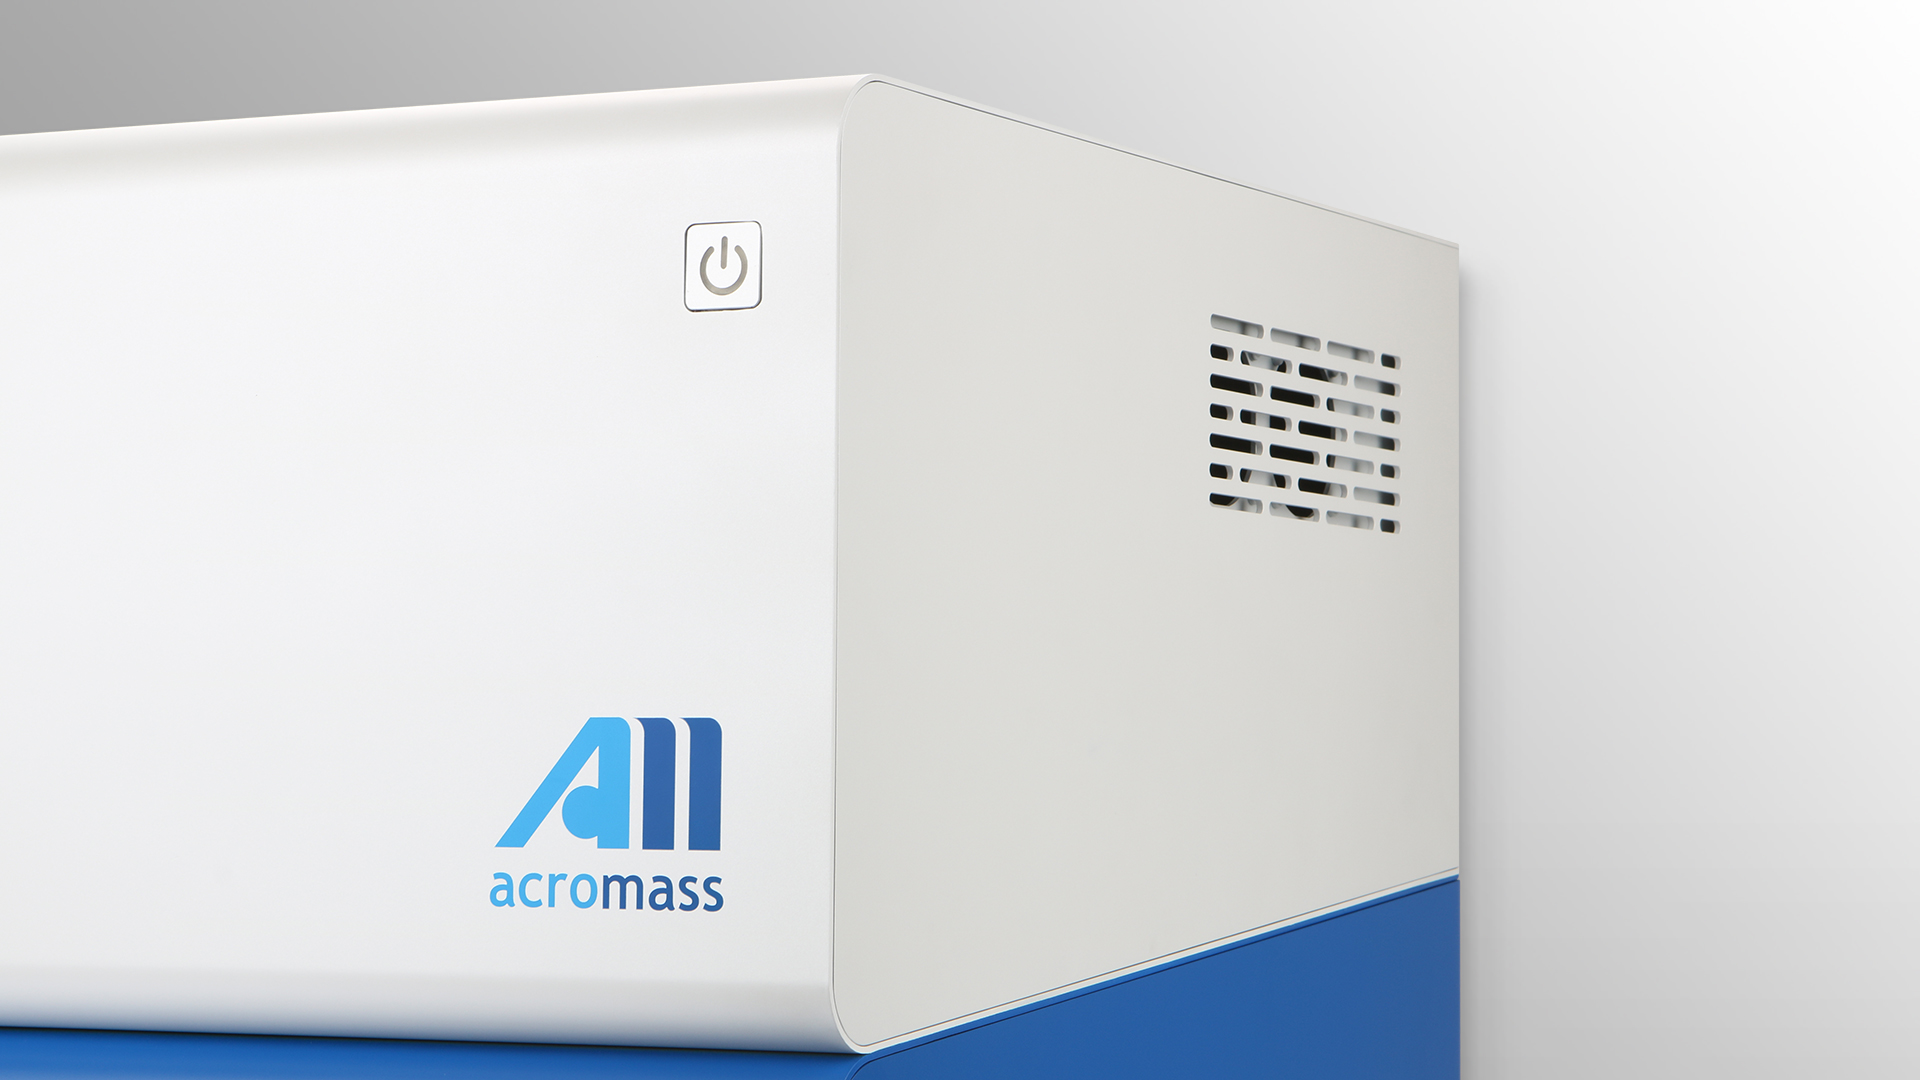 Acromass-CS_Pic06_1920x1080